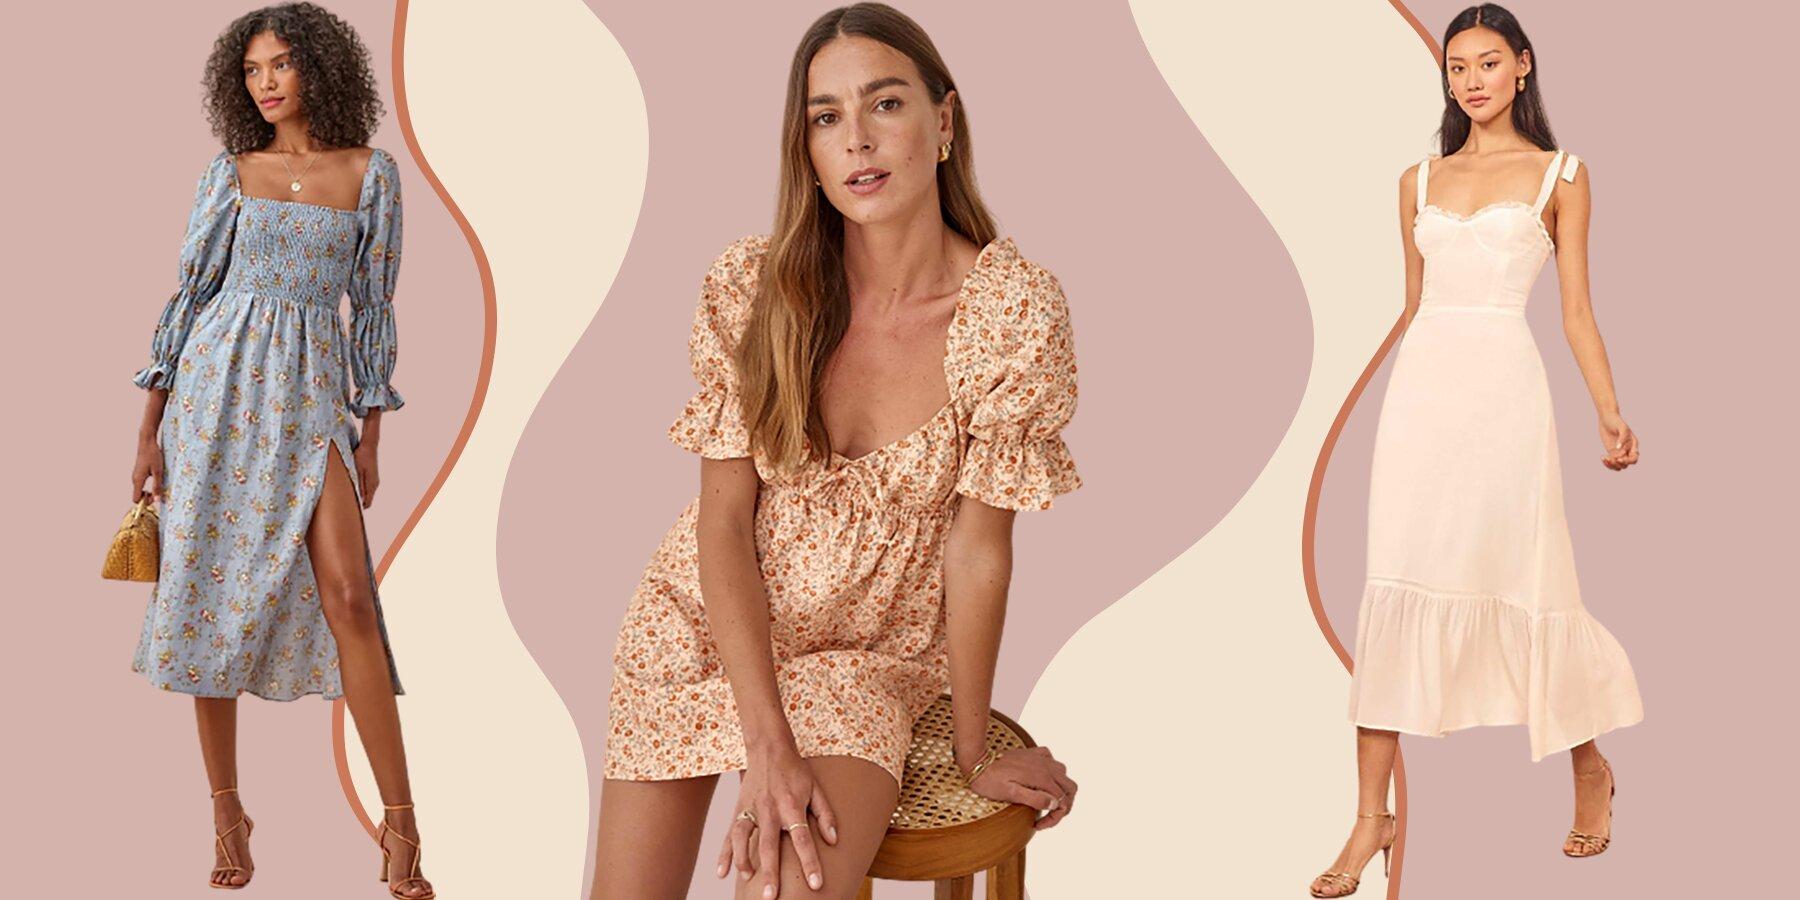 Channel Your Inner Duchess This Summer in 17 'Bridgerton'-Inspired Dresses